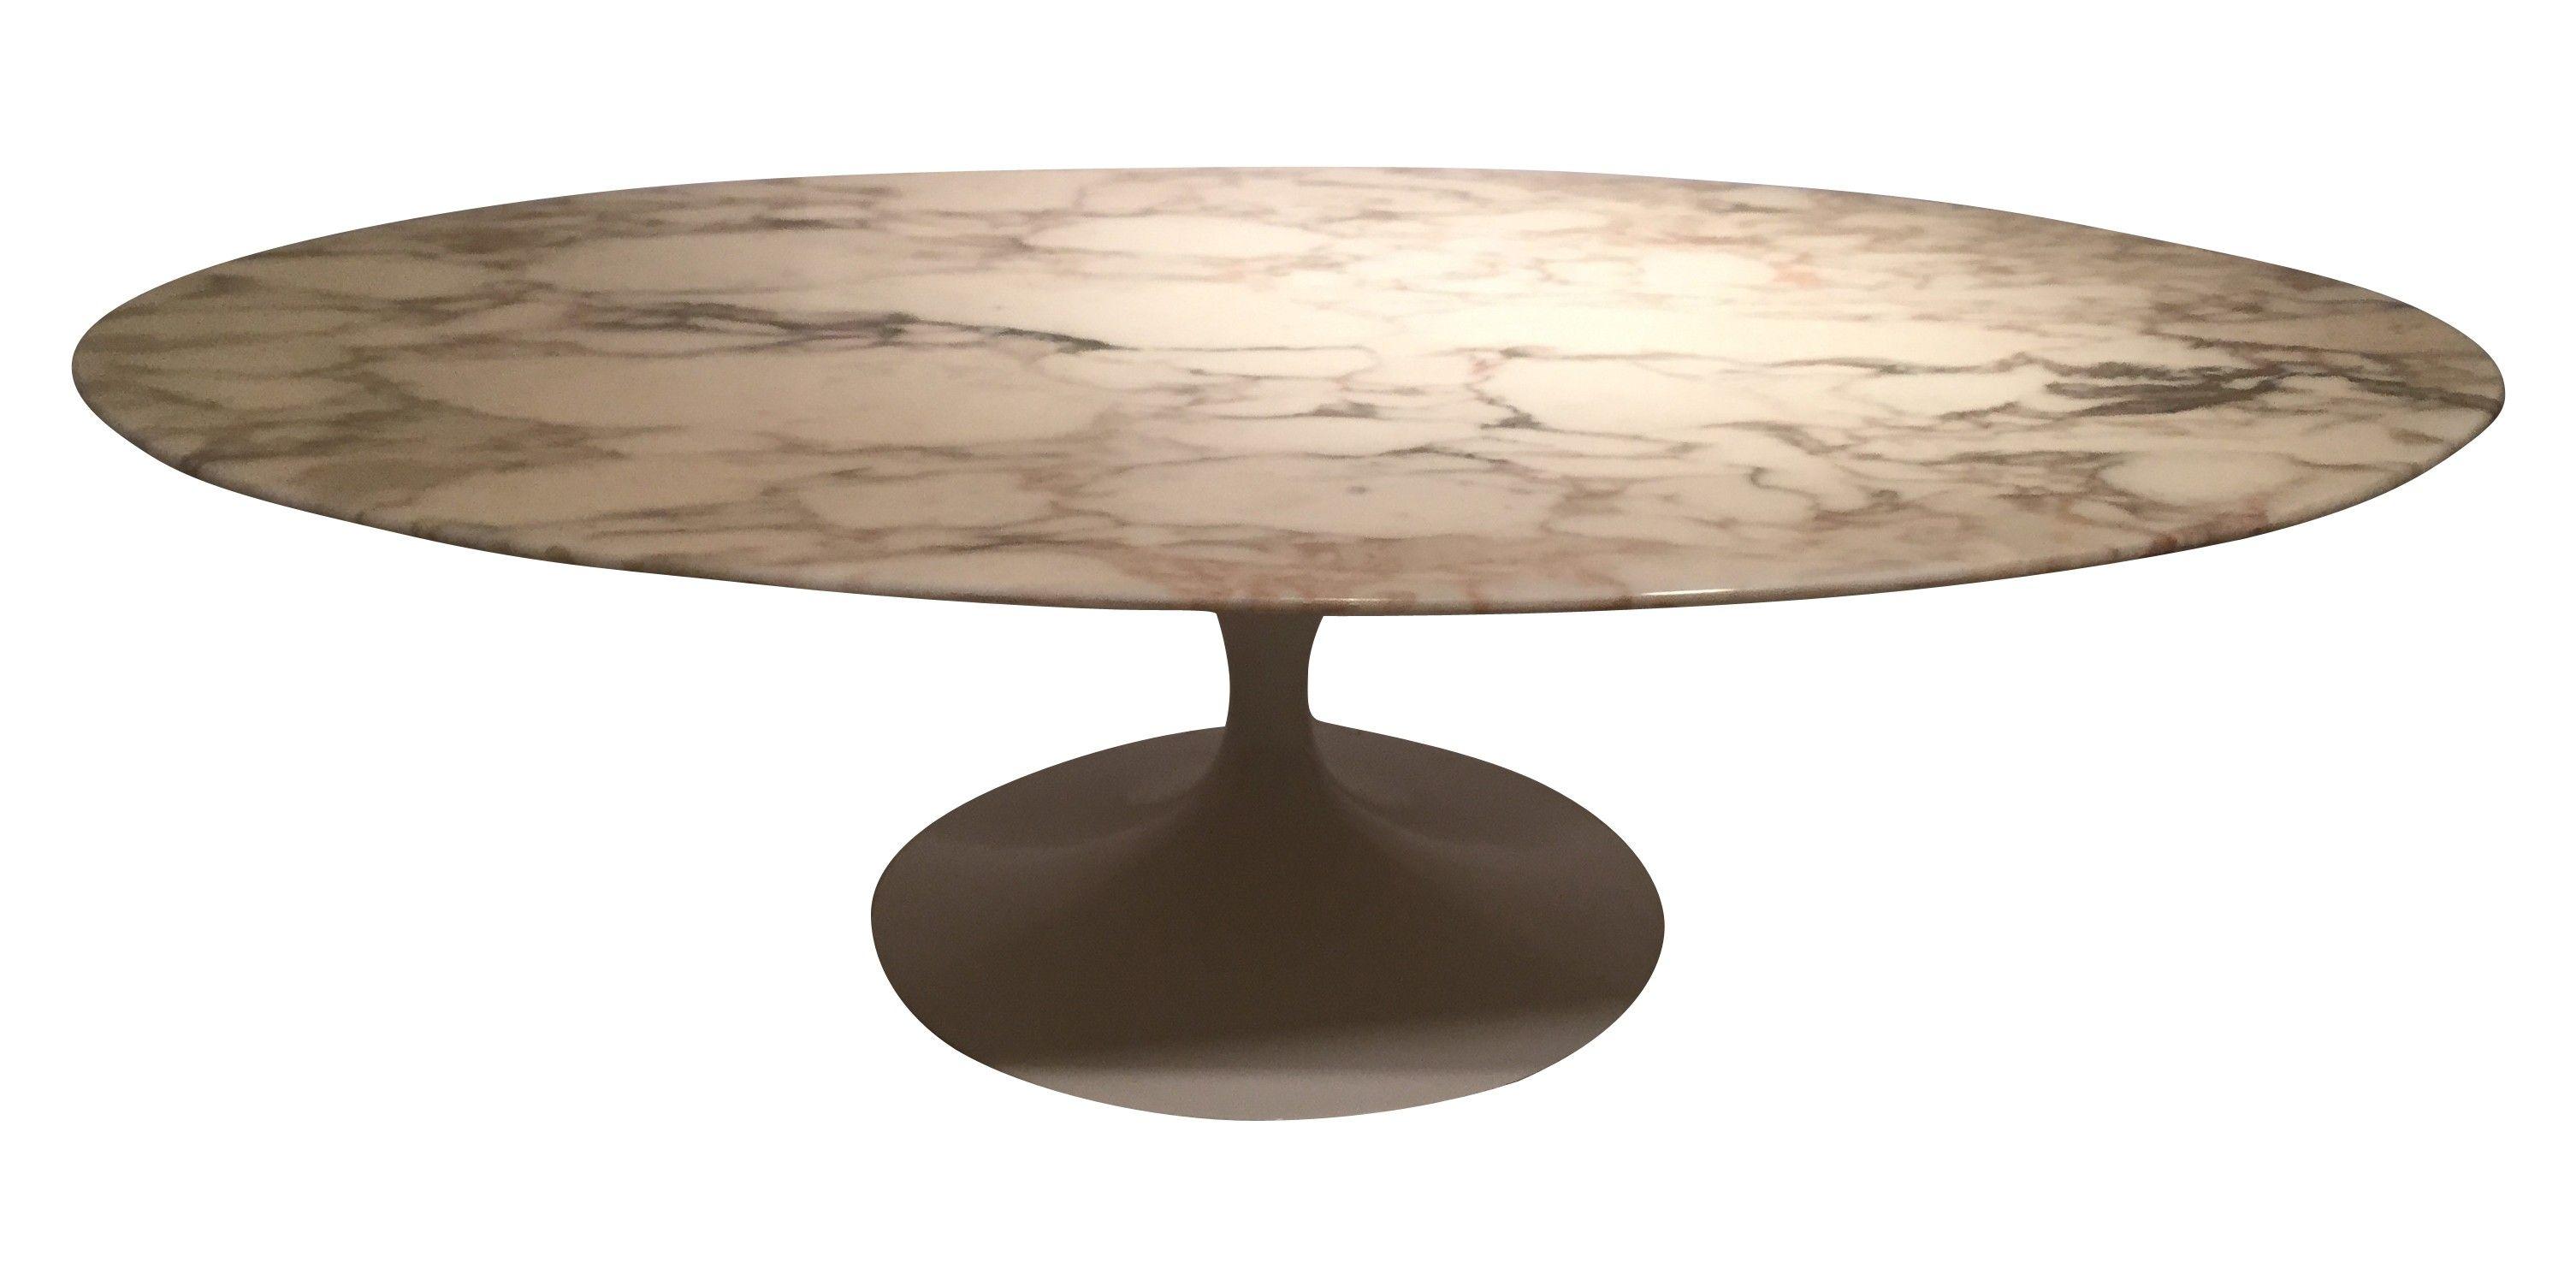 grande table basse ovale par eero saarinen datant des annes 70 edition - Grande Table Ovale